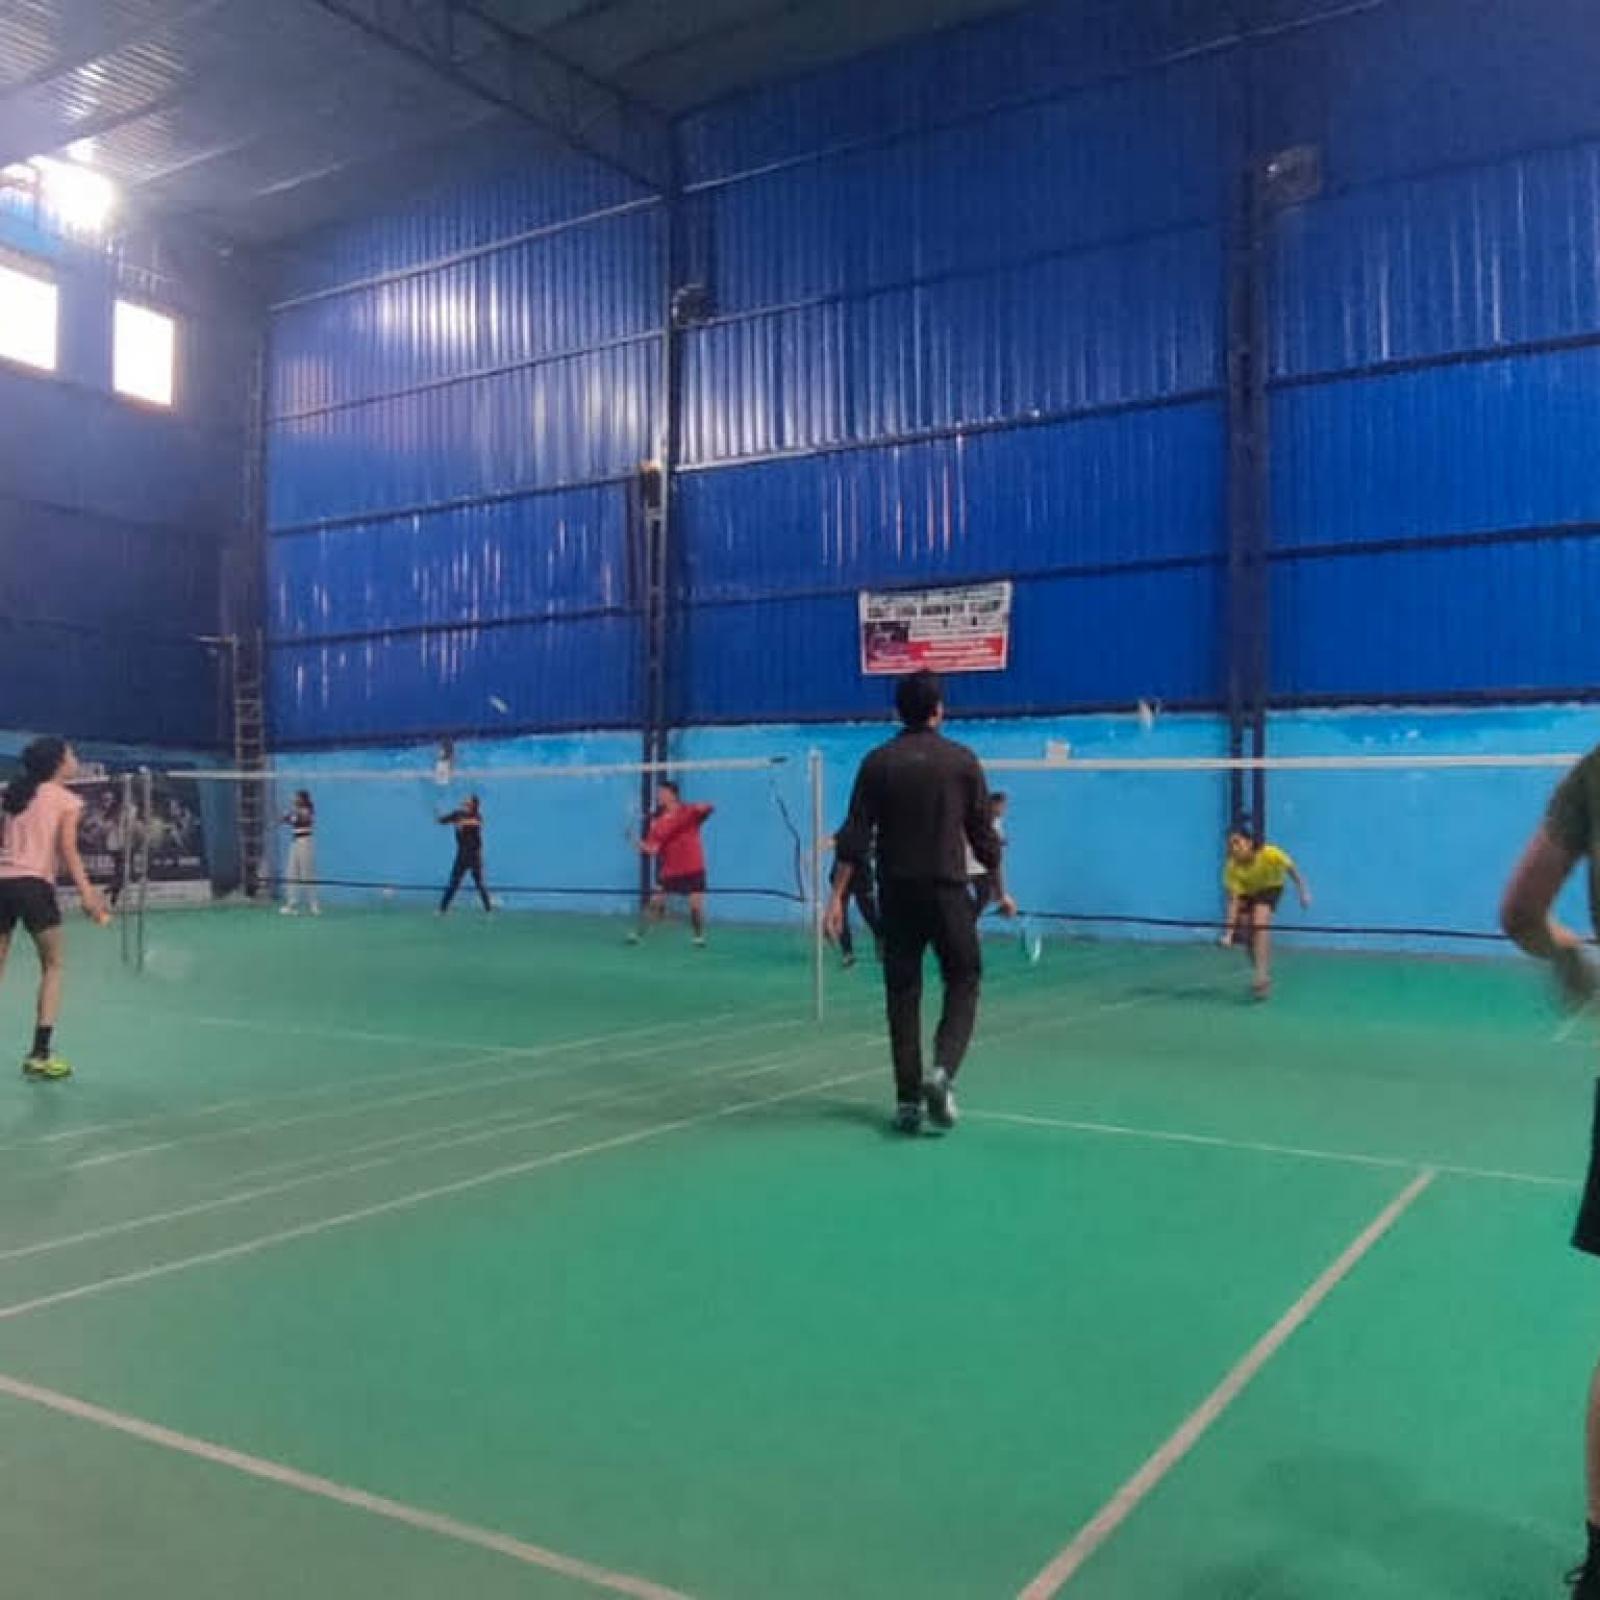 Surjit Singh Badminton Academy South Delhi - GW Sports App